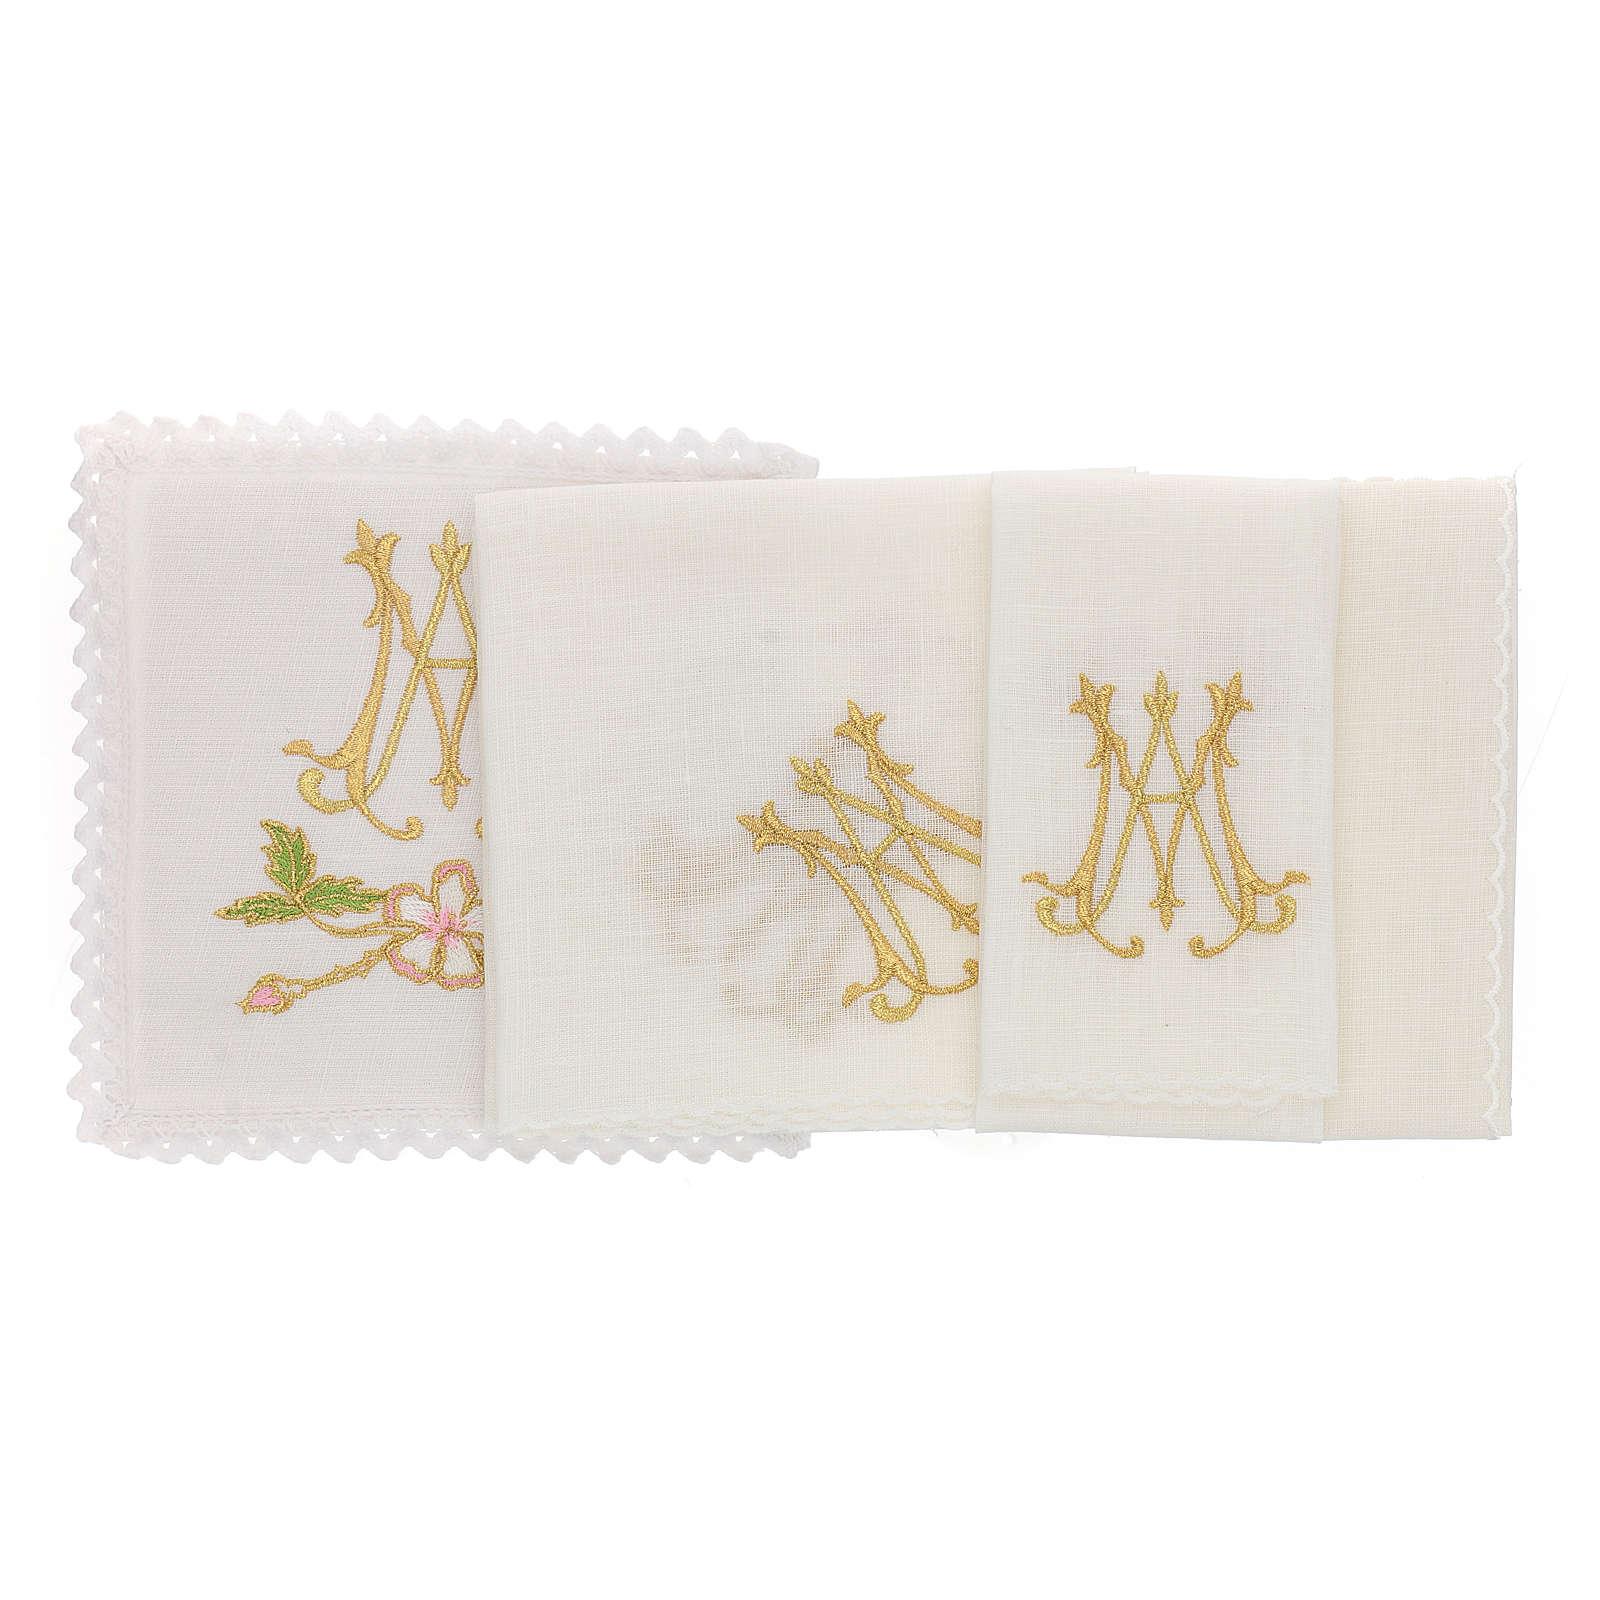 Altar linen set, 100% linen with Marian symbol 4